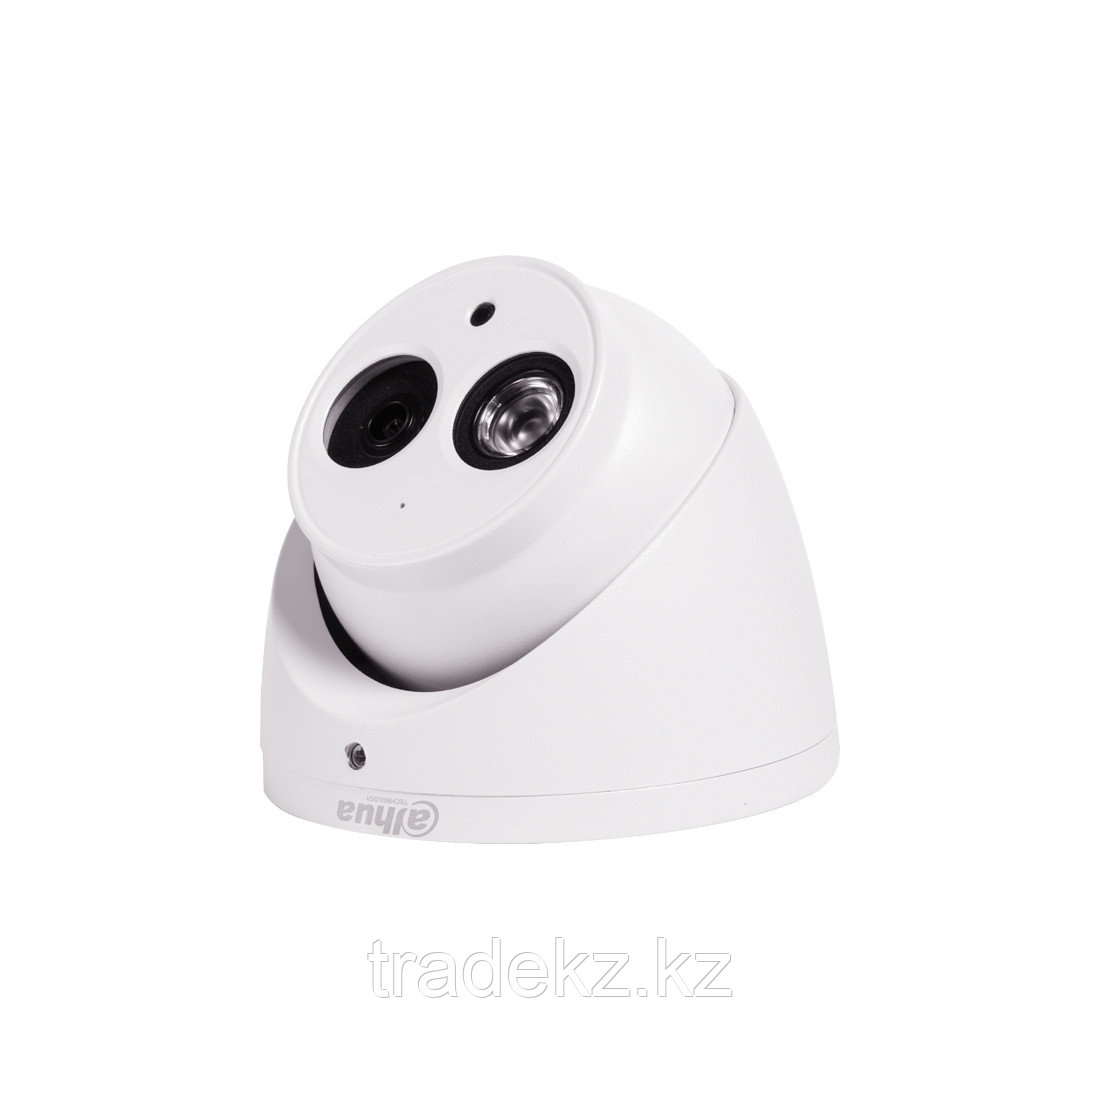 Купольная сетевая камера Dahua DH-IPC-HDW4231EMP-ASE